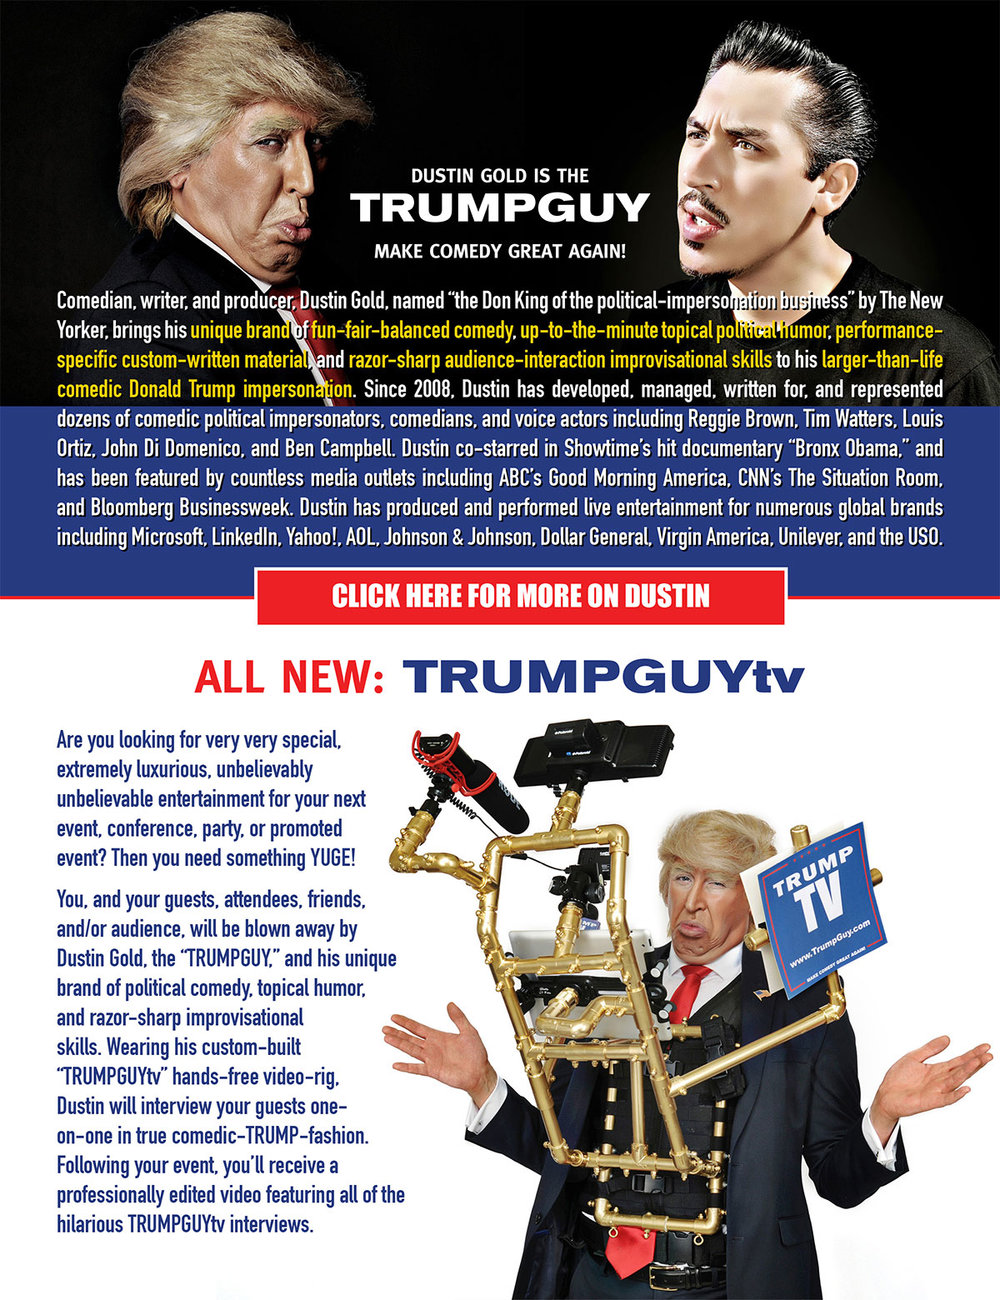 dustin-gold-trump-impersonator-press-kit-02